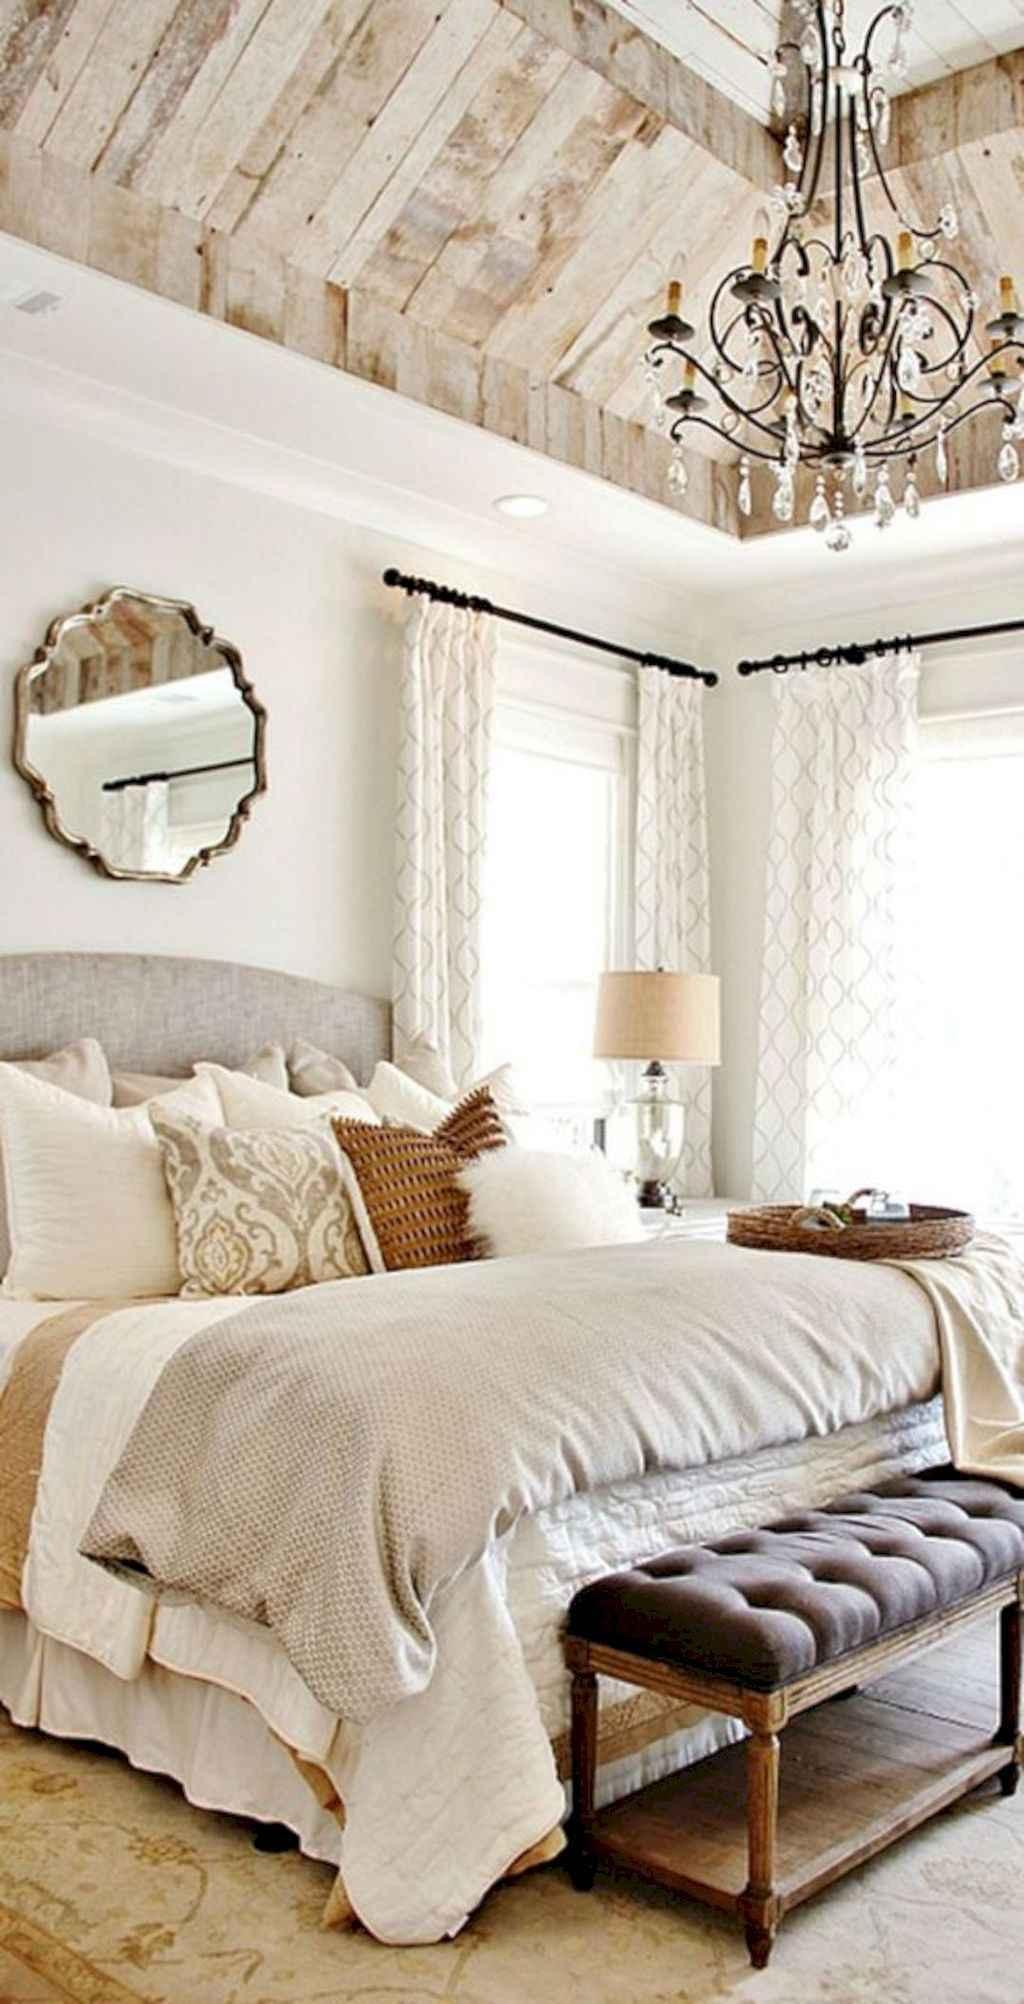 70 Beautiful Farmhouse Master Bedroom Decor Ideas 3 Roomadness Com